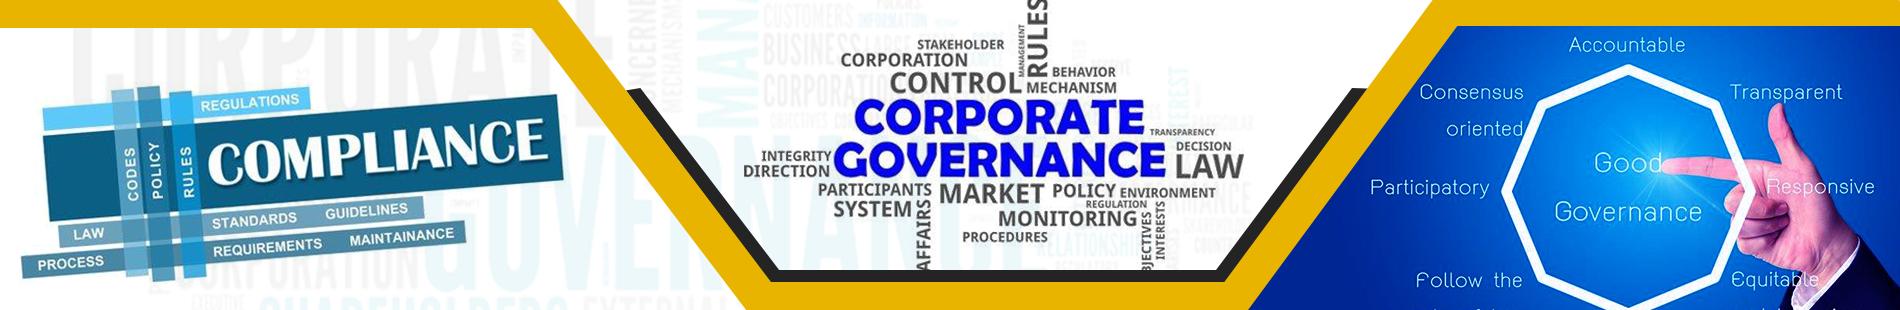 KMP Authorization under Regulation 30 of SEBI Regulation